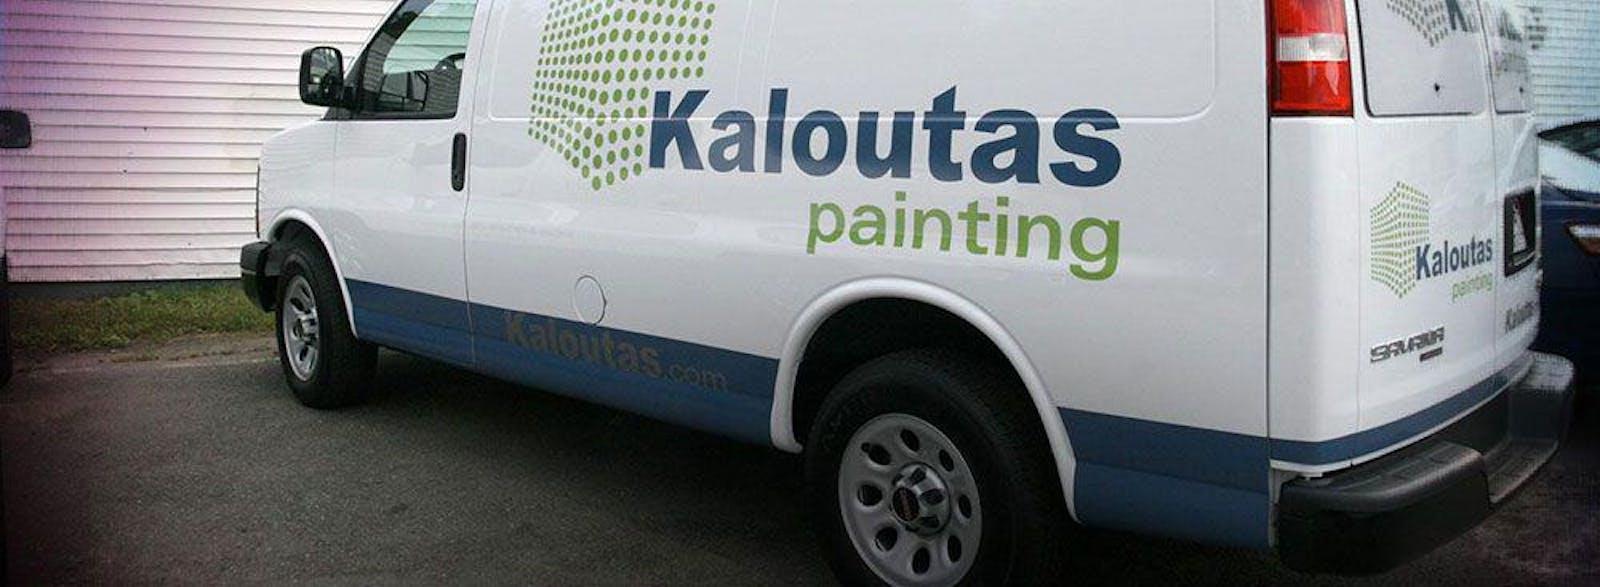 Kaloutas Painting